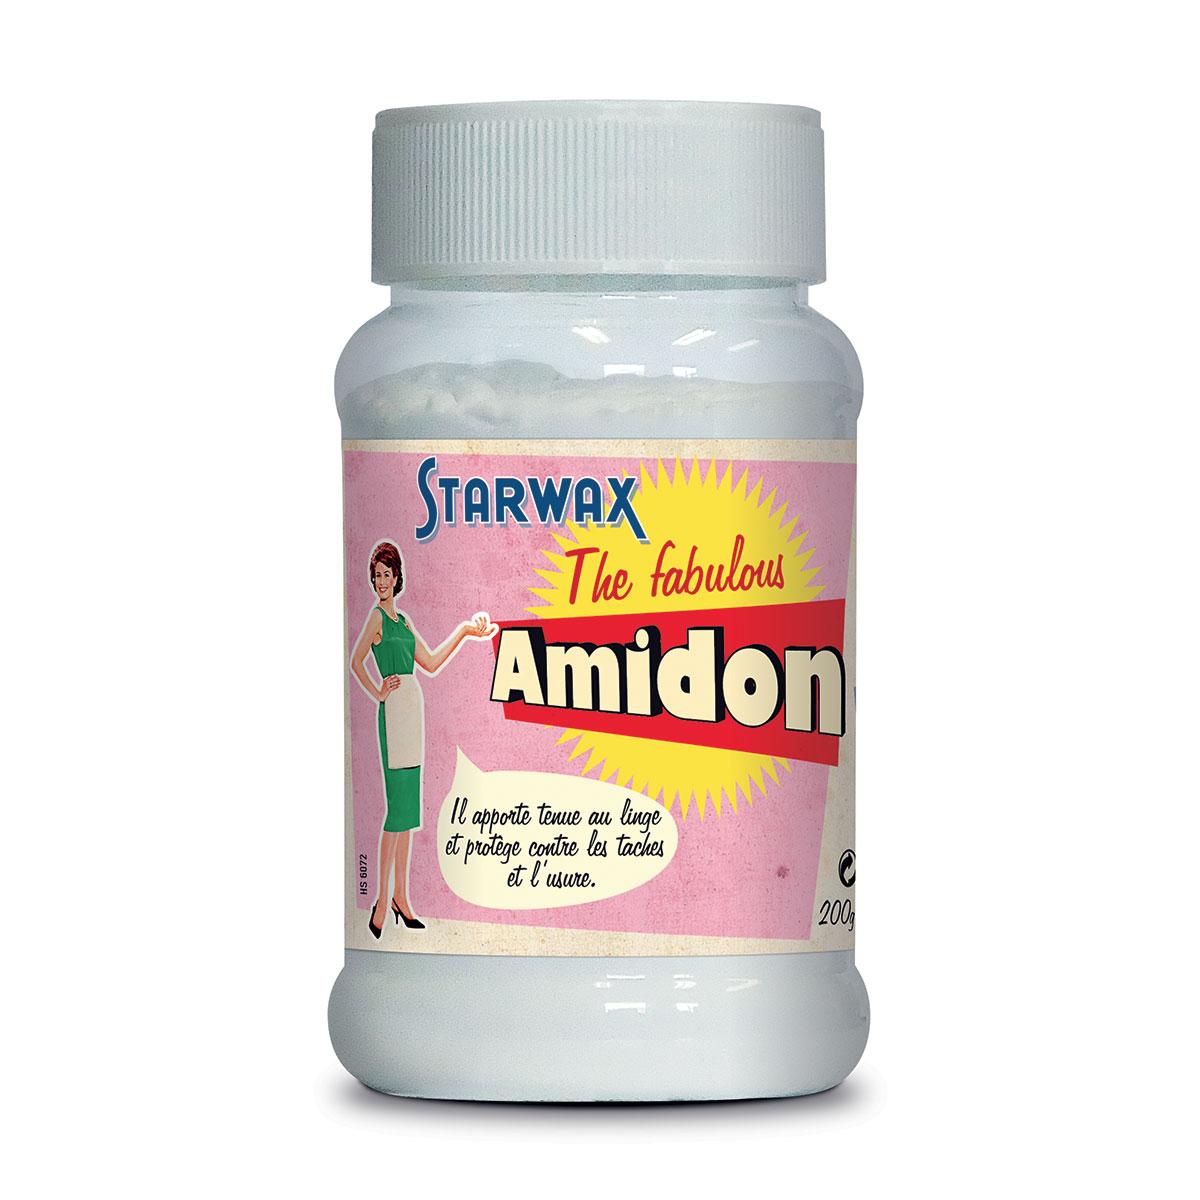 Amidon - Starwax The Fabulous